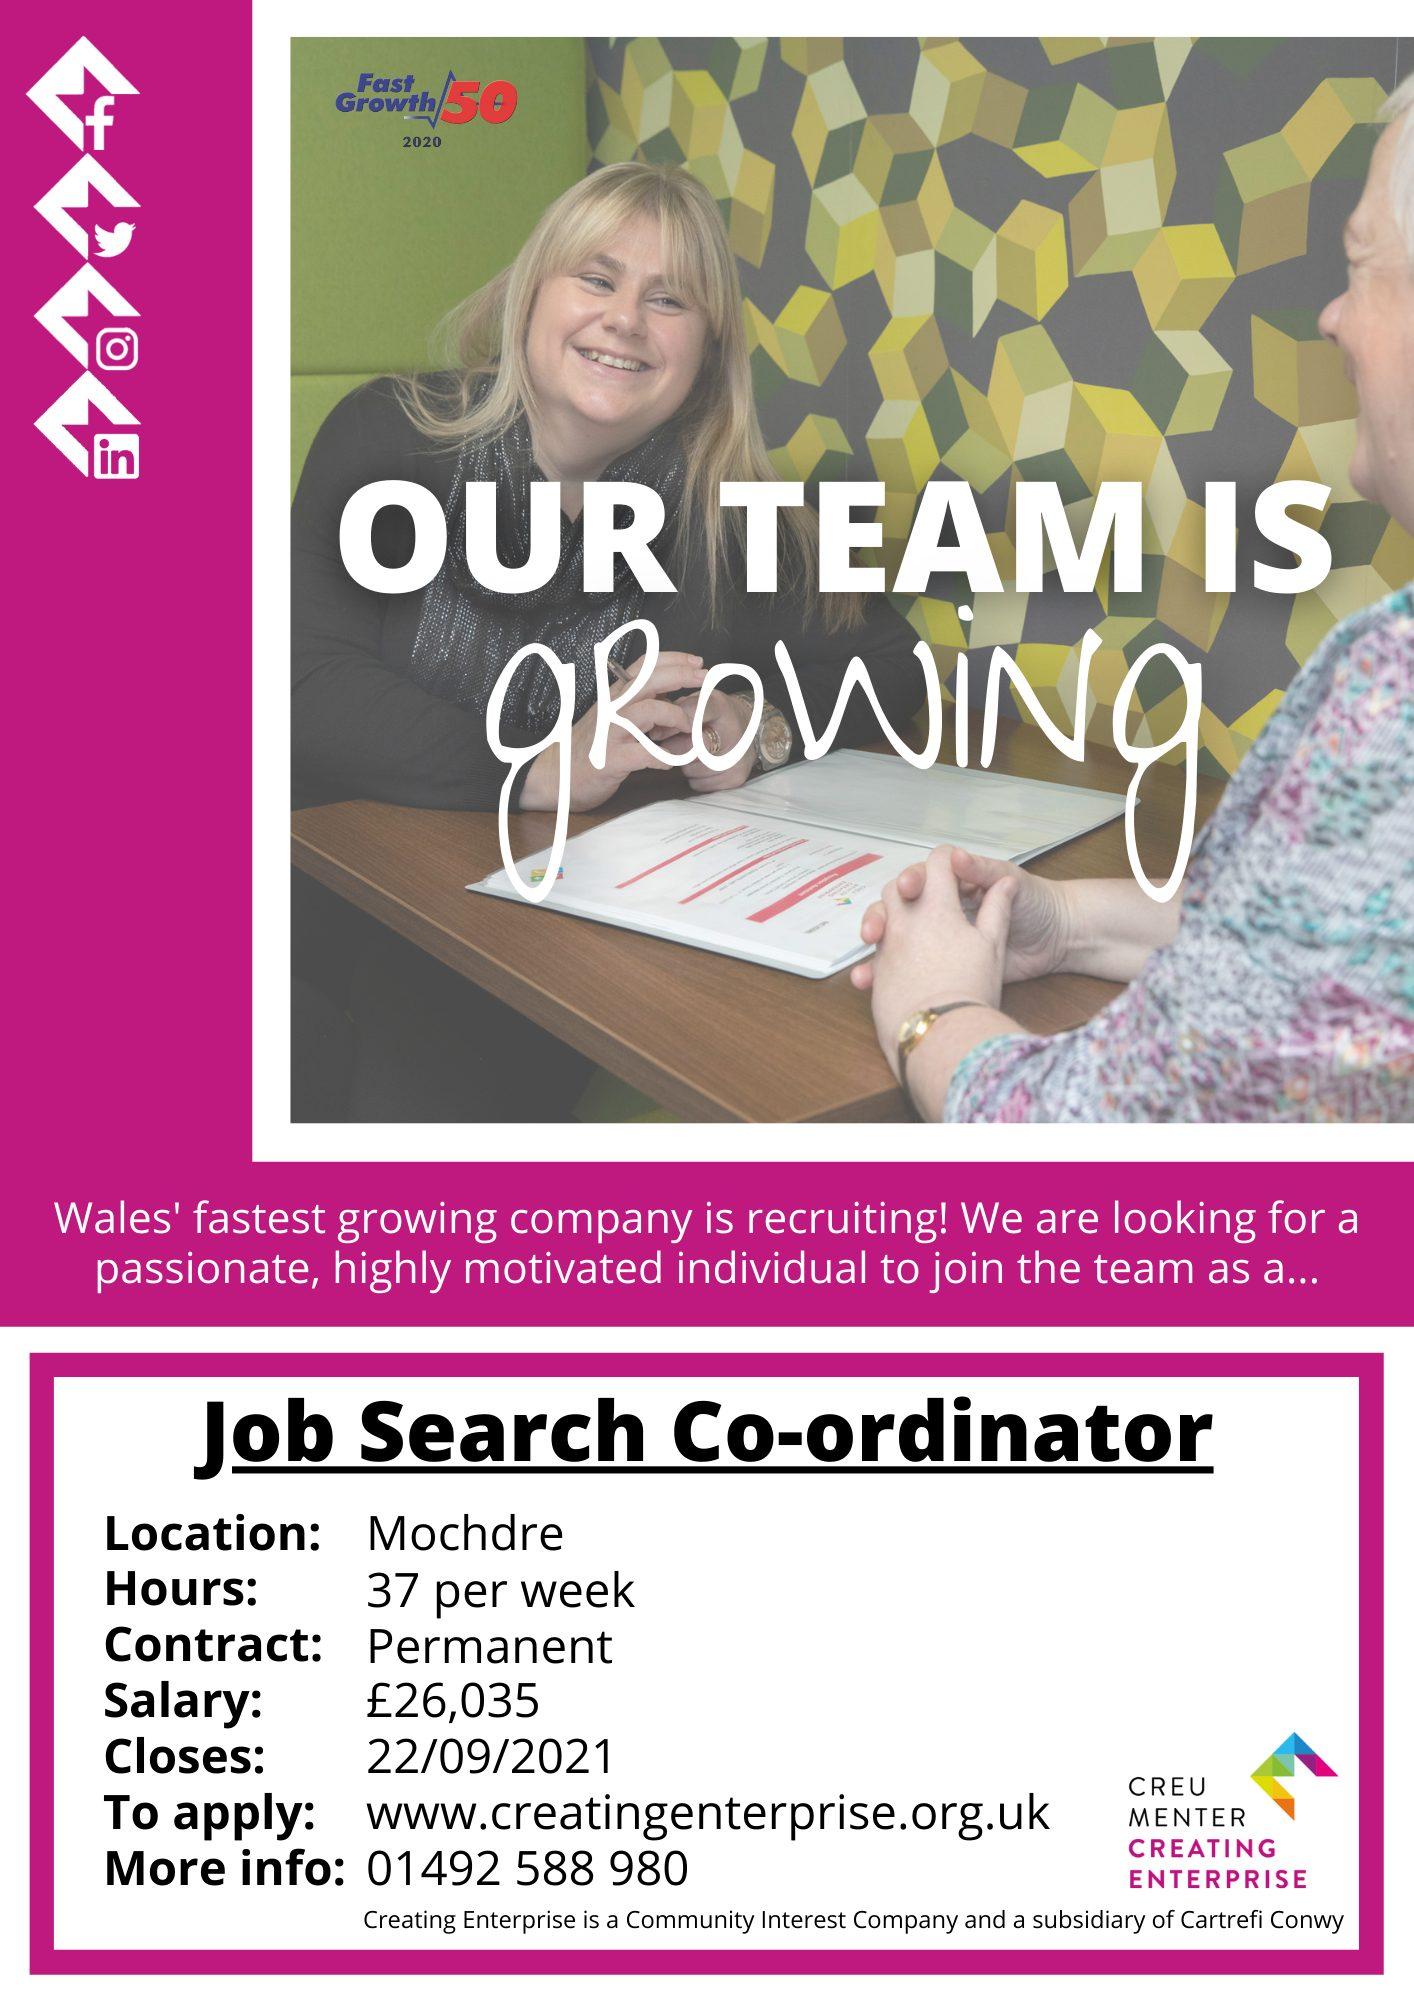 Job Search Co-ordinator